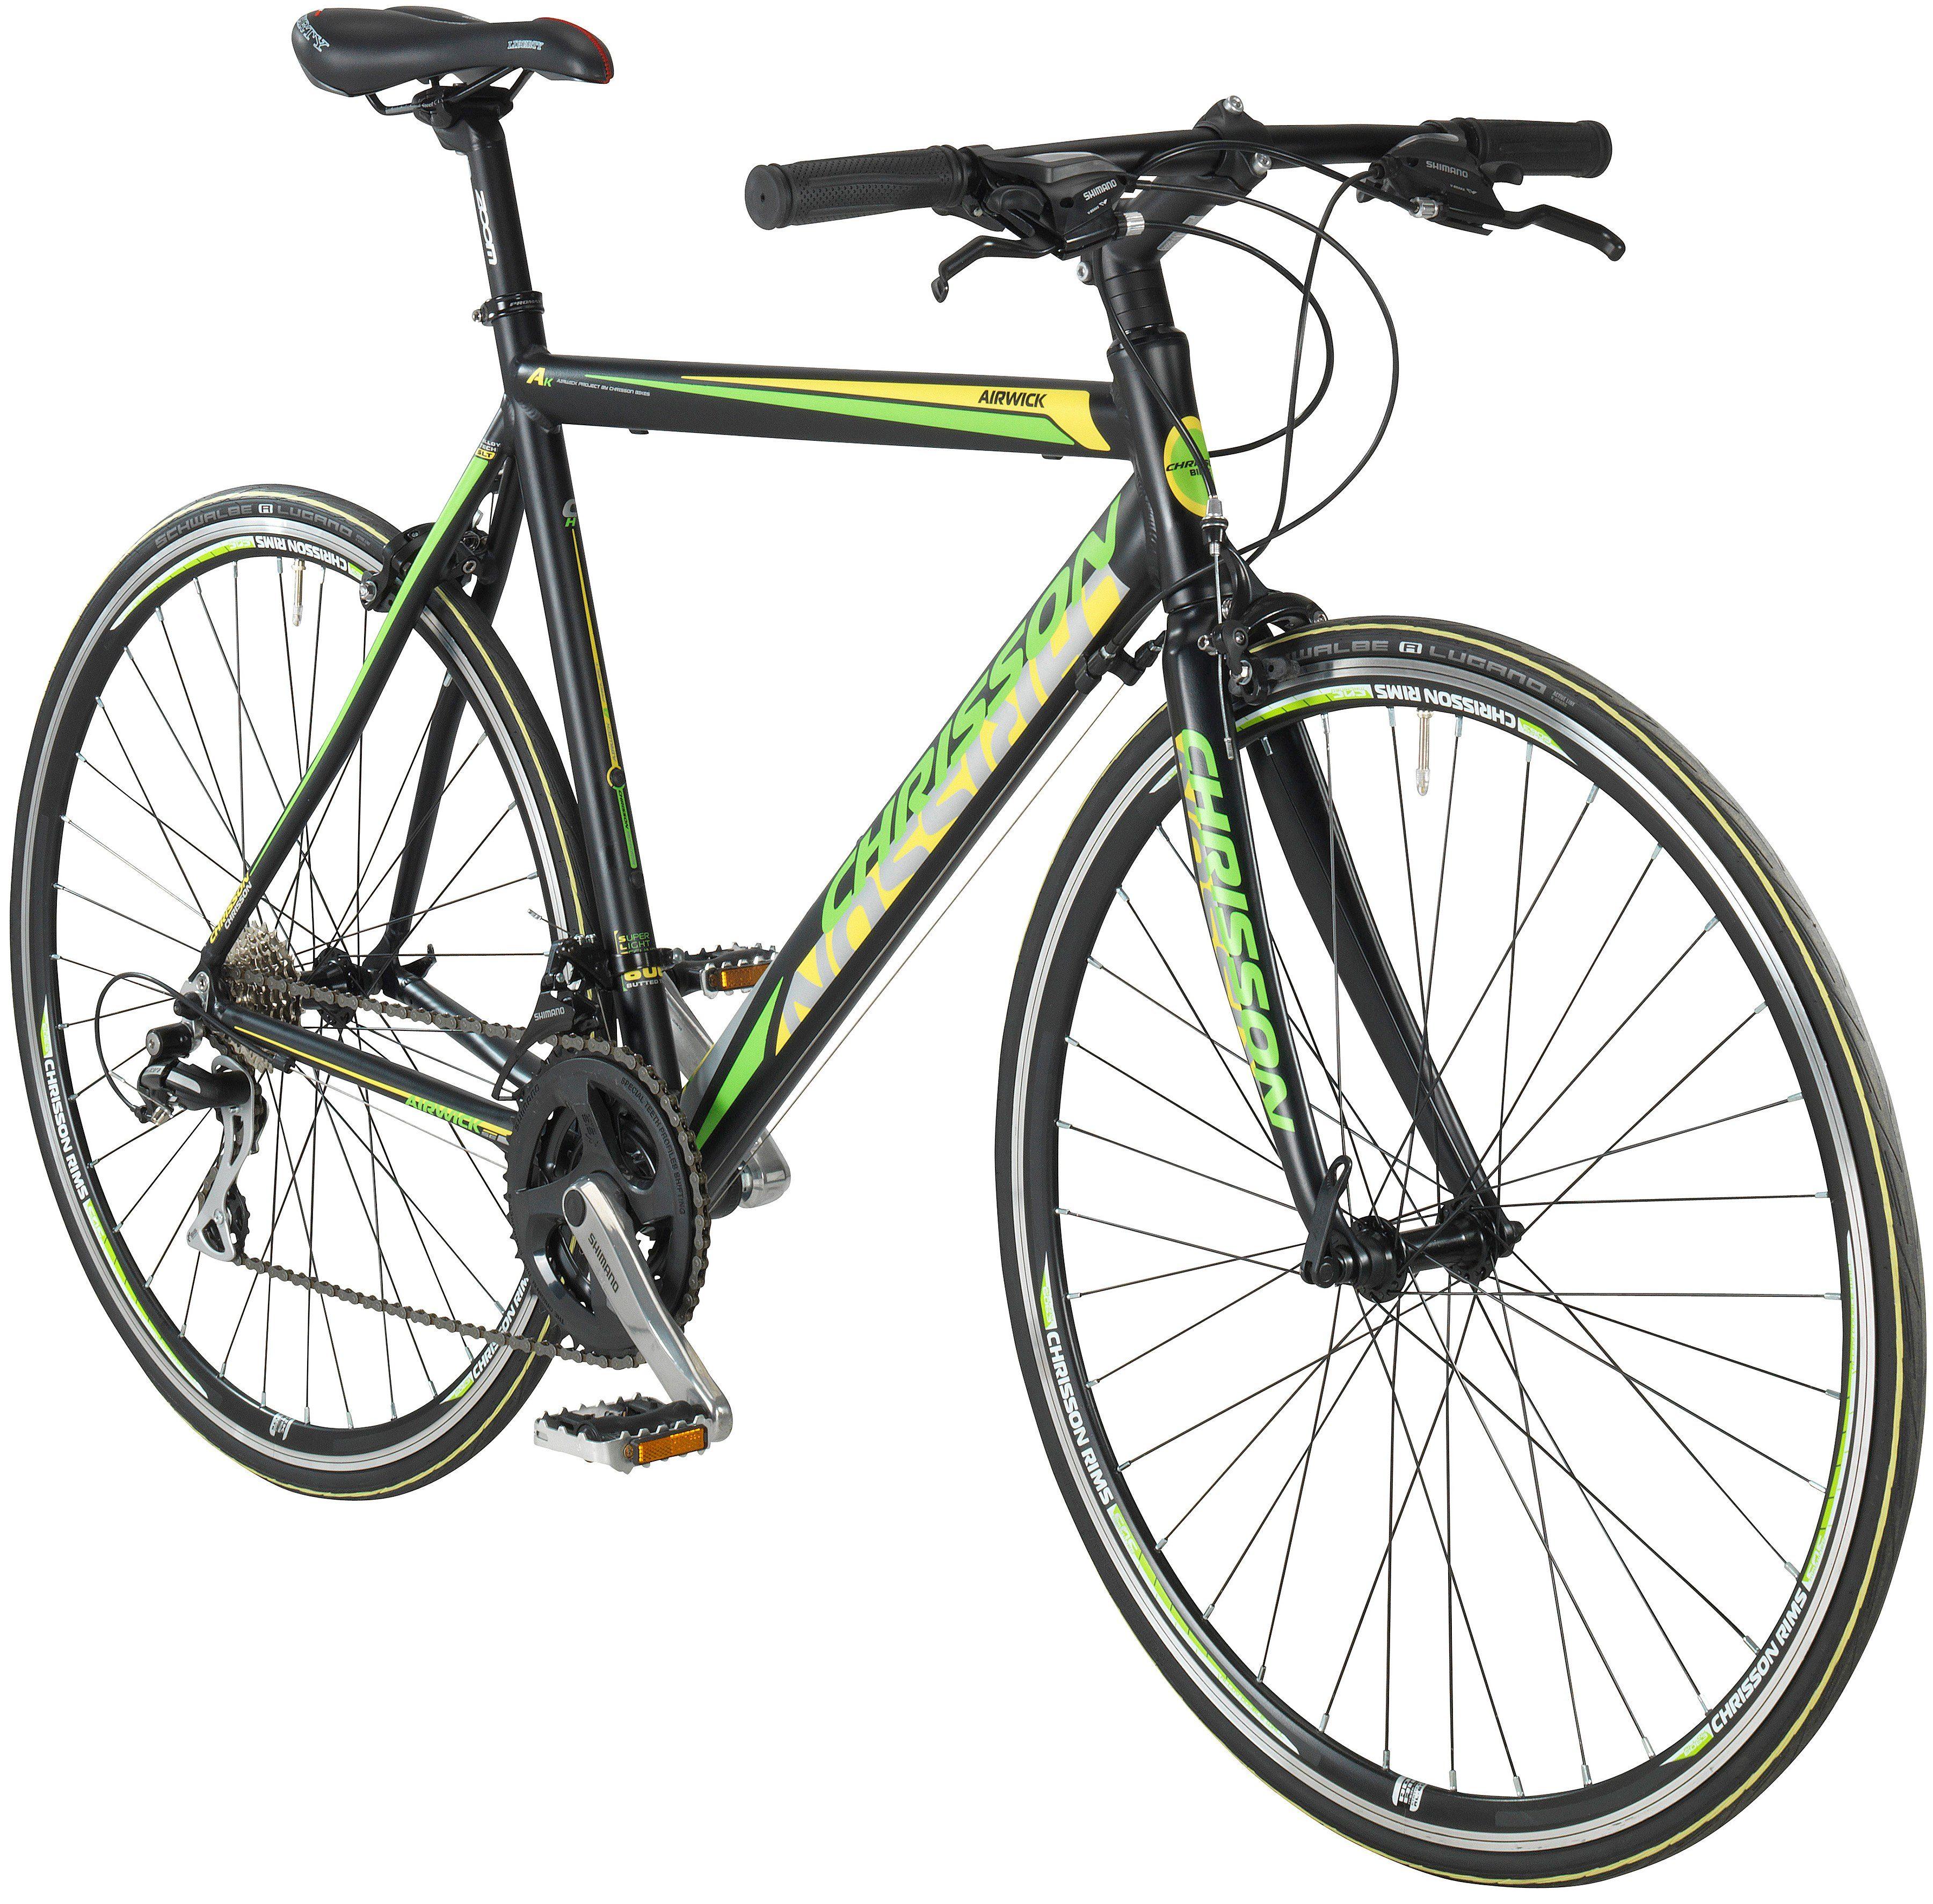 CHRISSON Fitnessbike »AIRWICK«, 28 Zoll, 24 Gang, Rennbremsen, RH 53